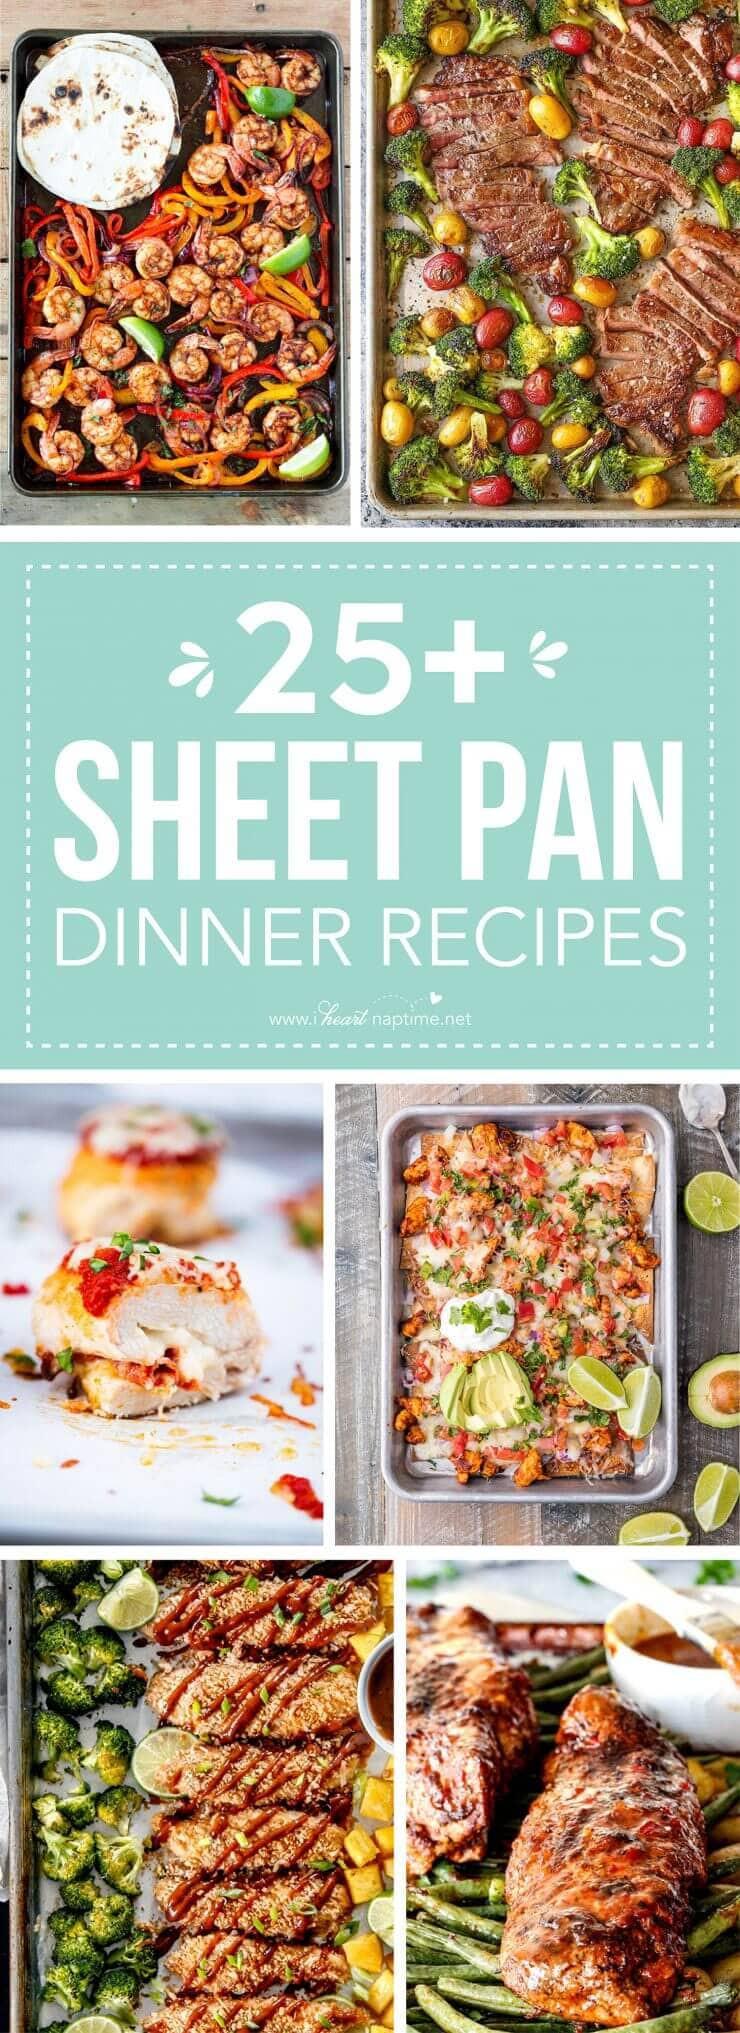 Sheet Pan Dinner Recipes  25 Delicious Sheet Pan Dinner Recipes I Heart Nap Time